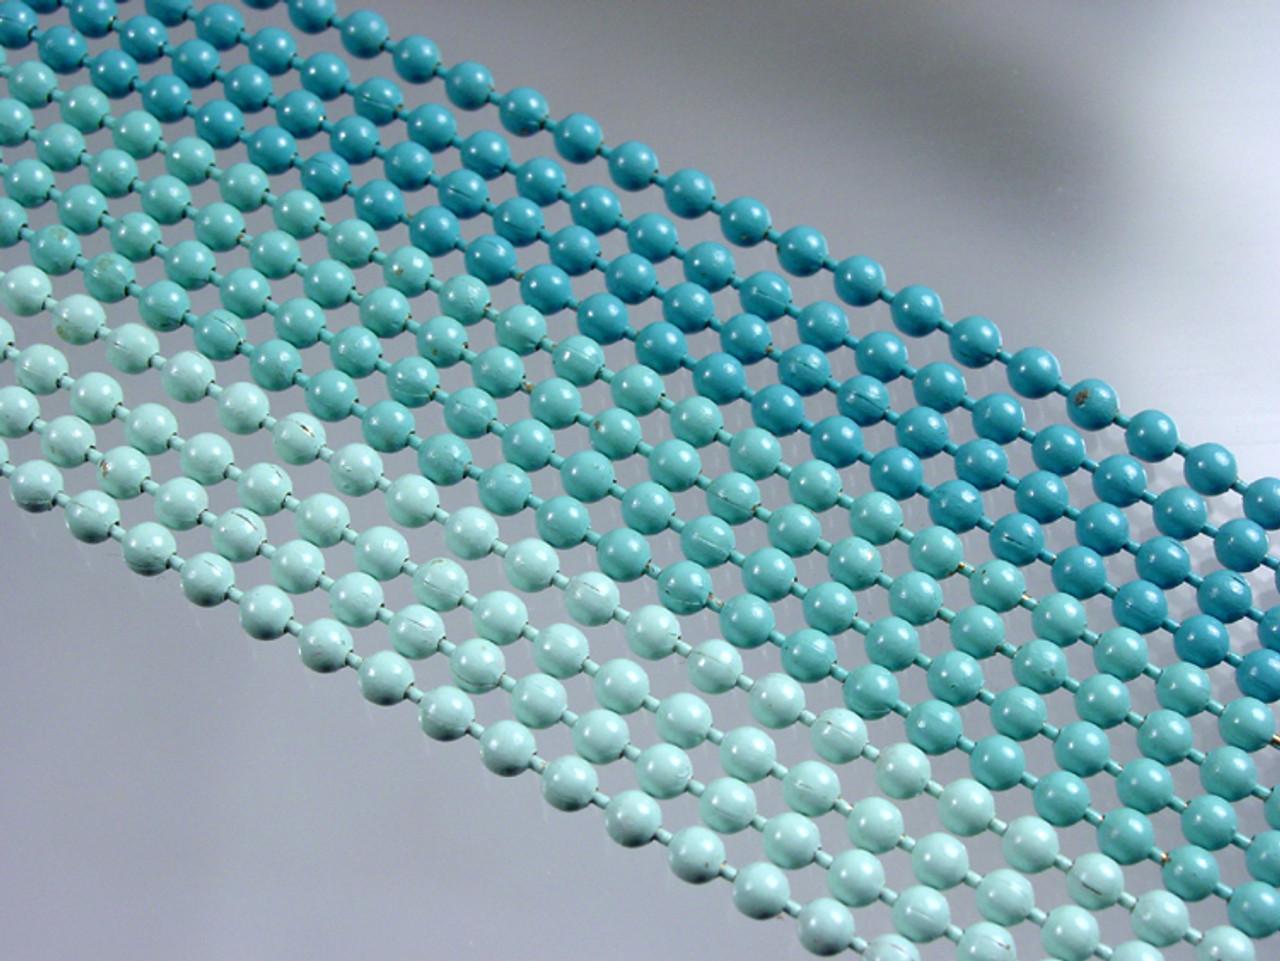 12 strands of enameled metal beads